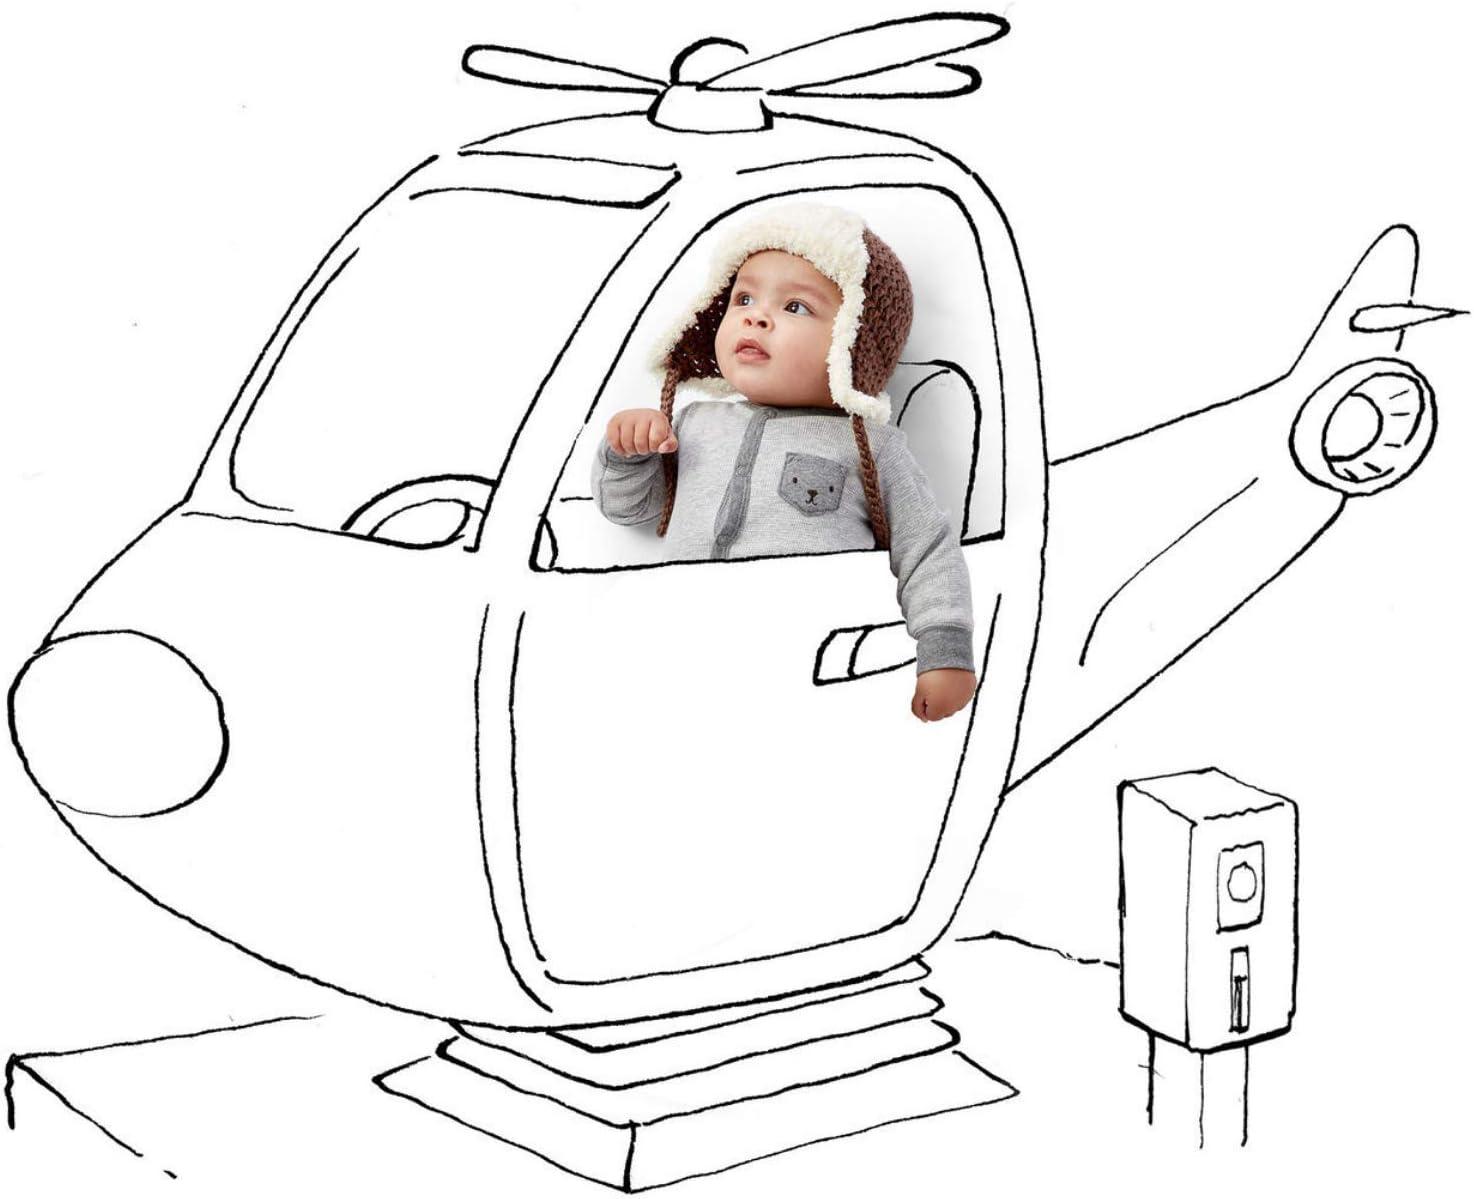 Bernat Softee Baby Chunky Yarn Gauge 5 Bulky Chunky Teddy Brown Solid 5 oz